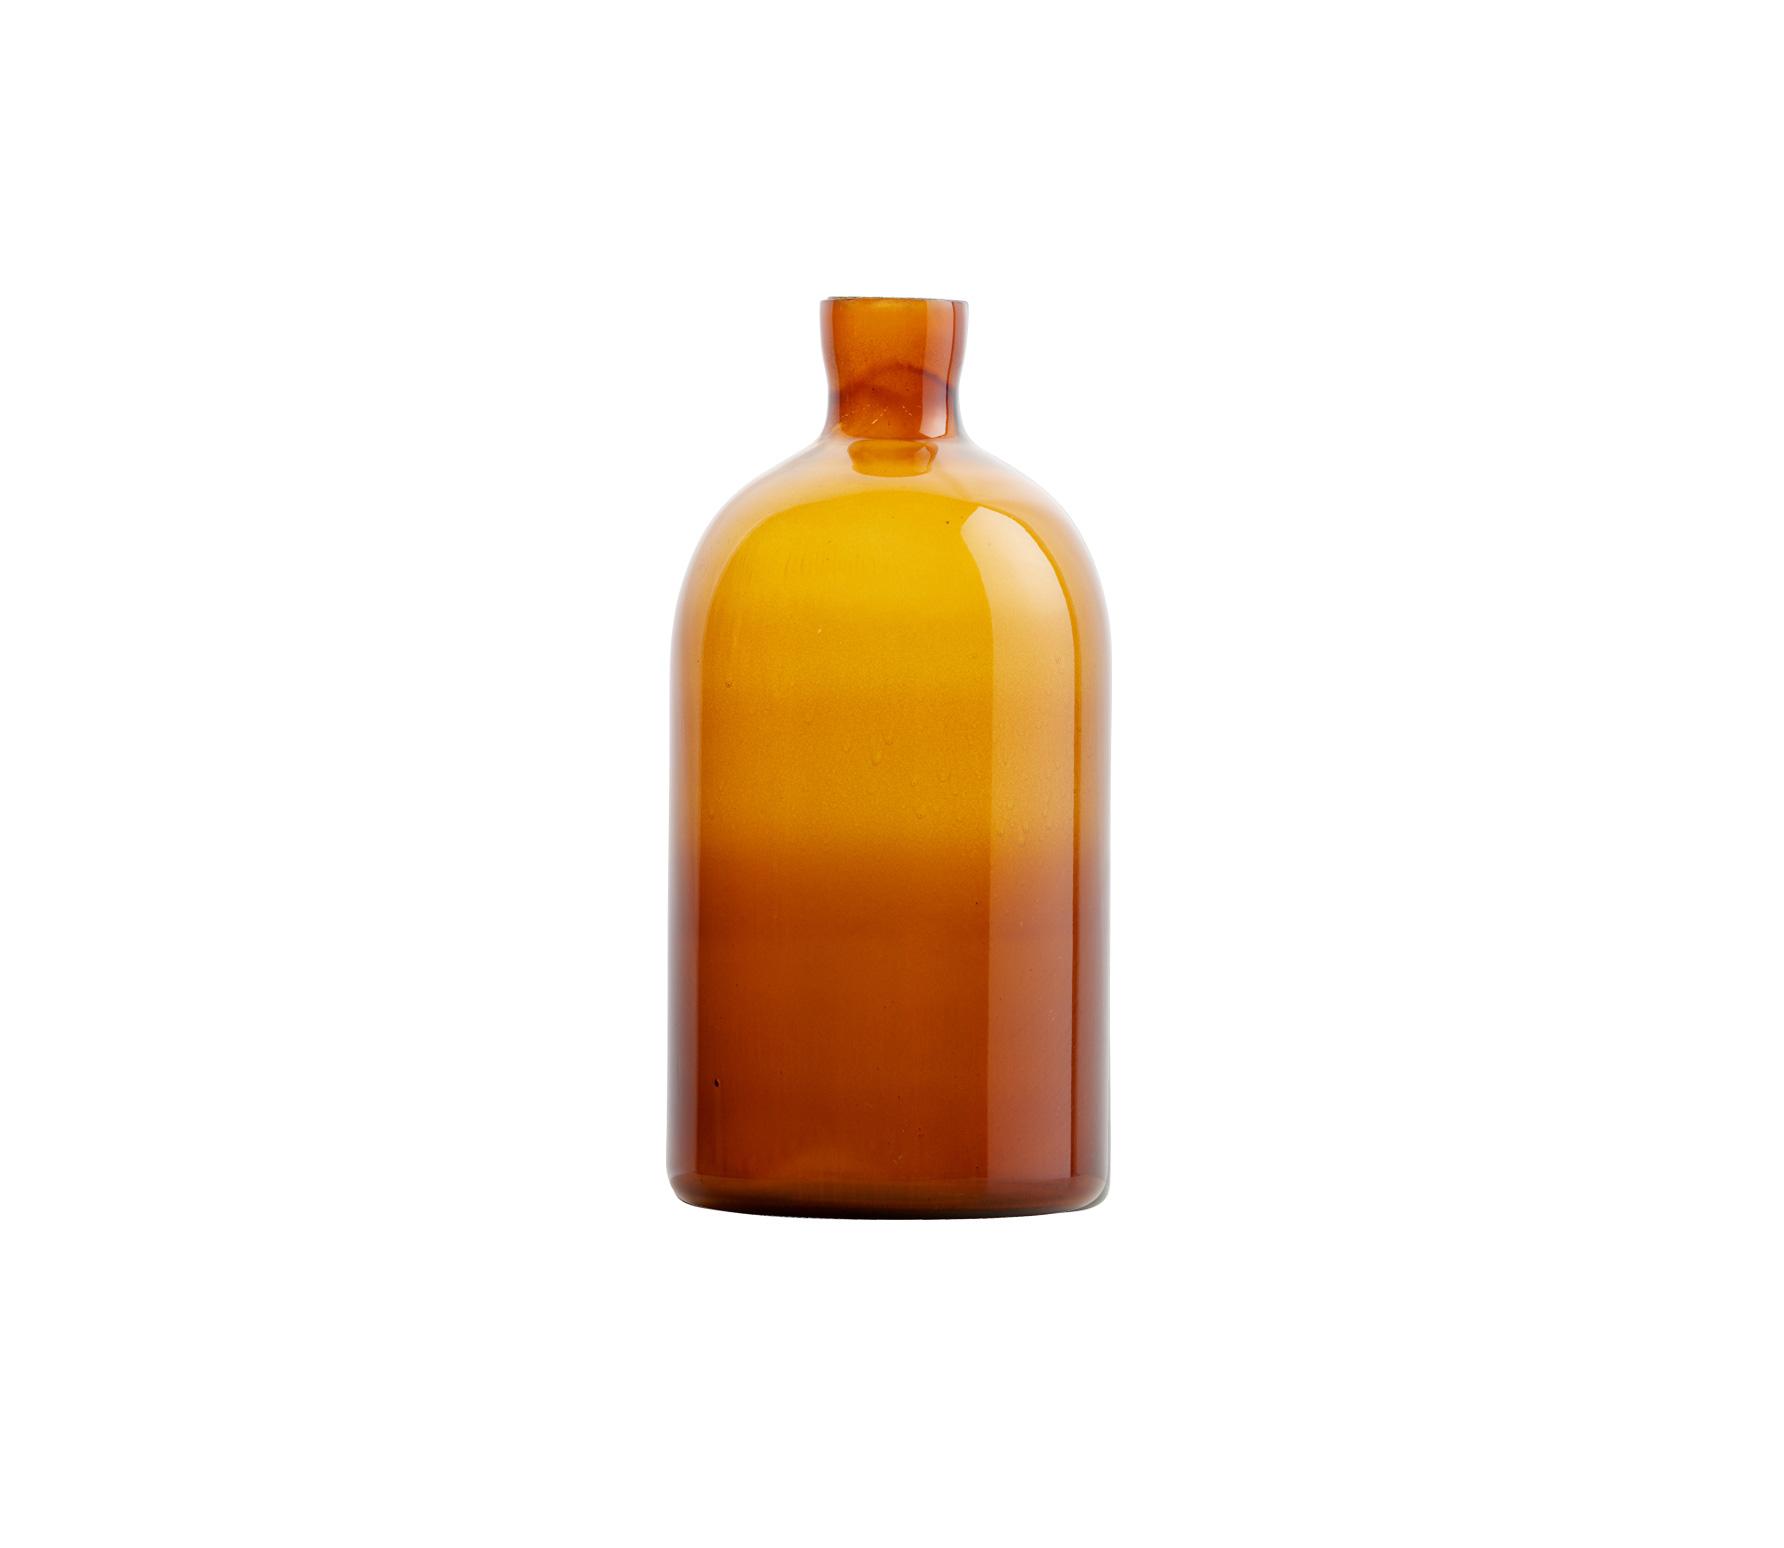 BePureHome Chemistry glazen vaas Large bruin Bruin